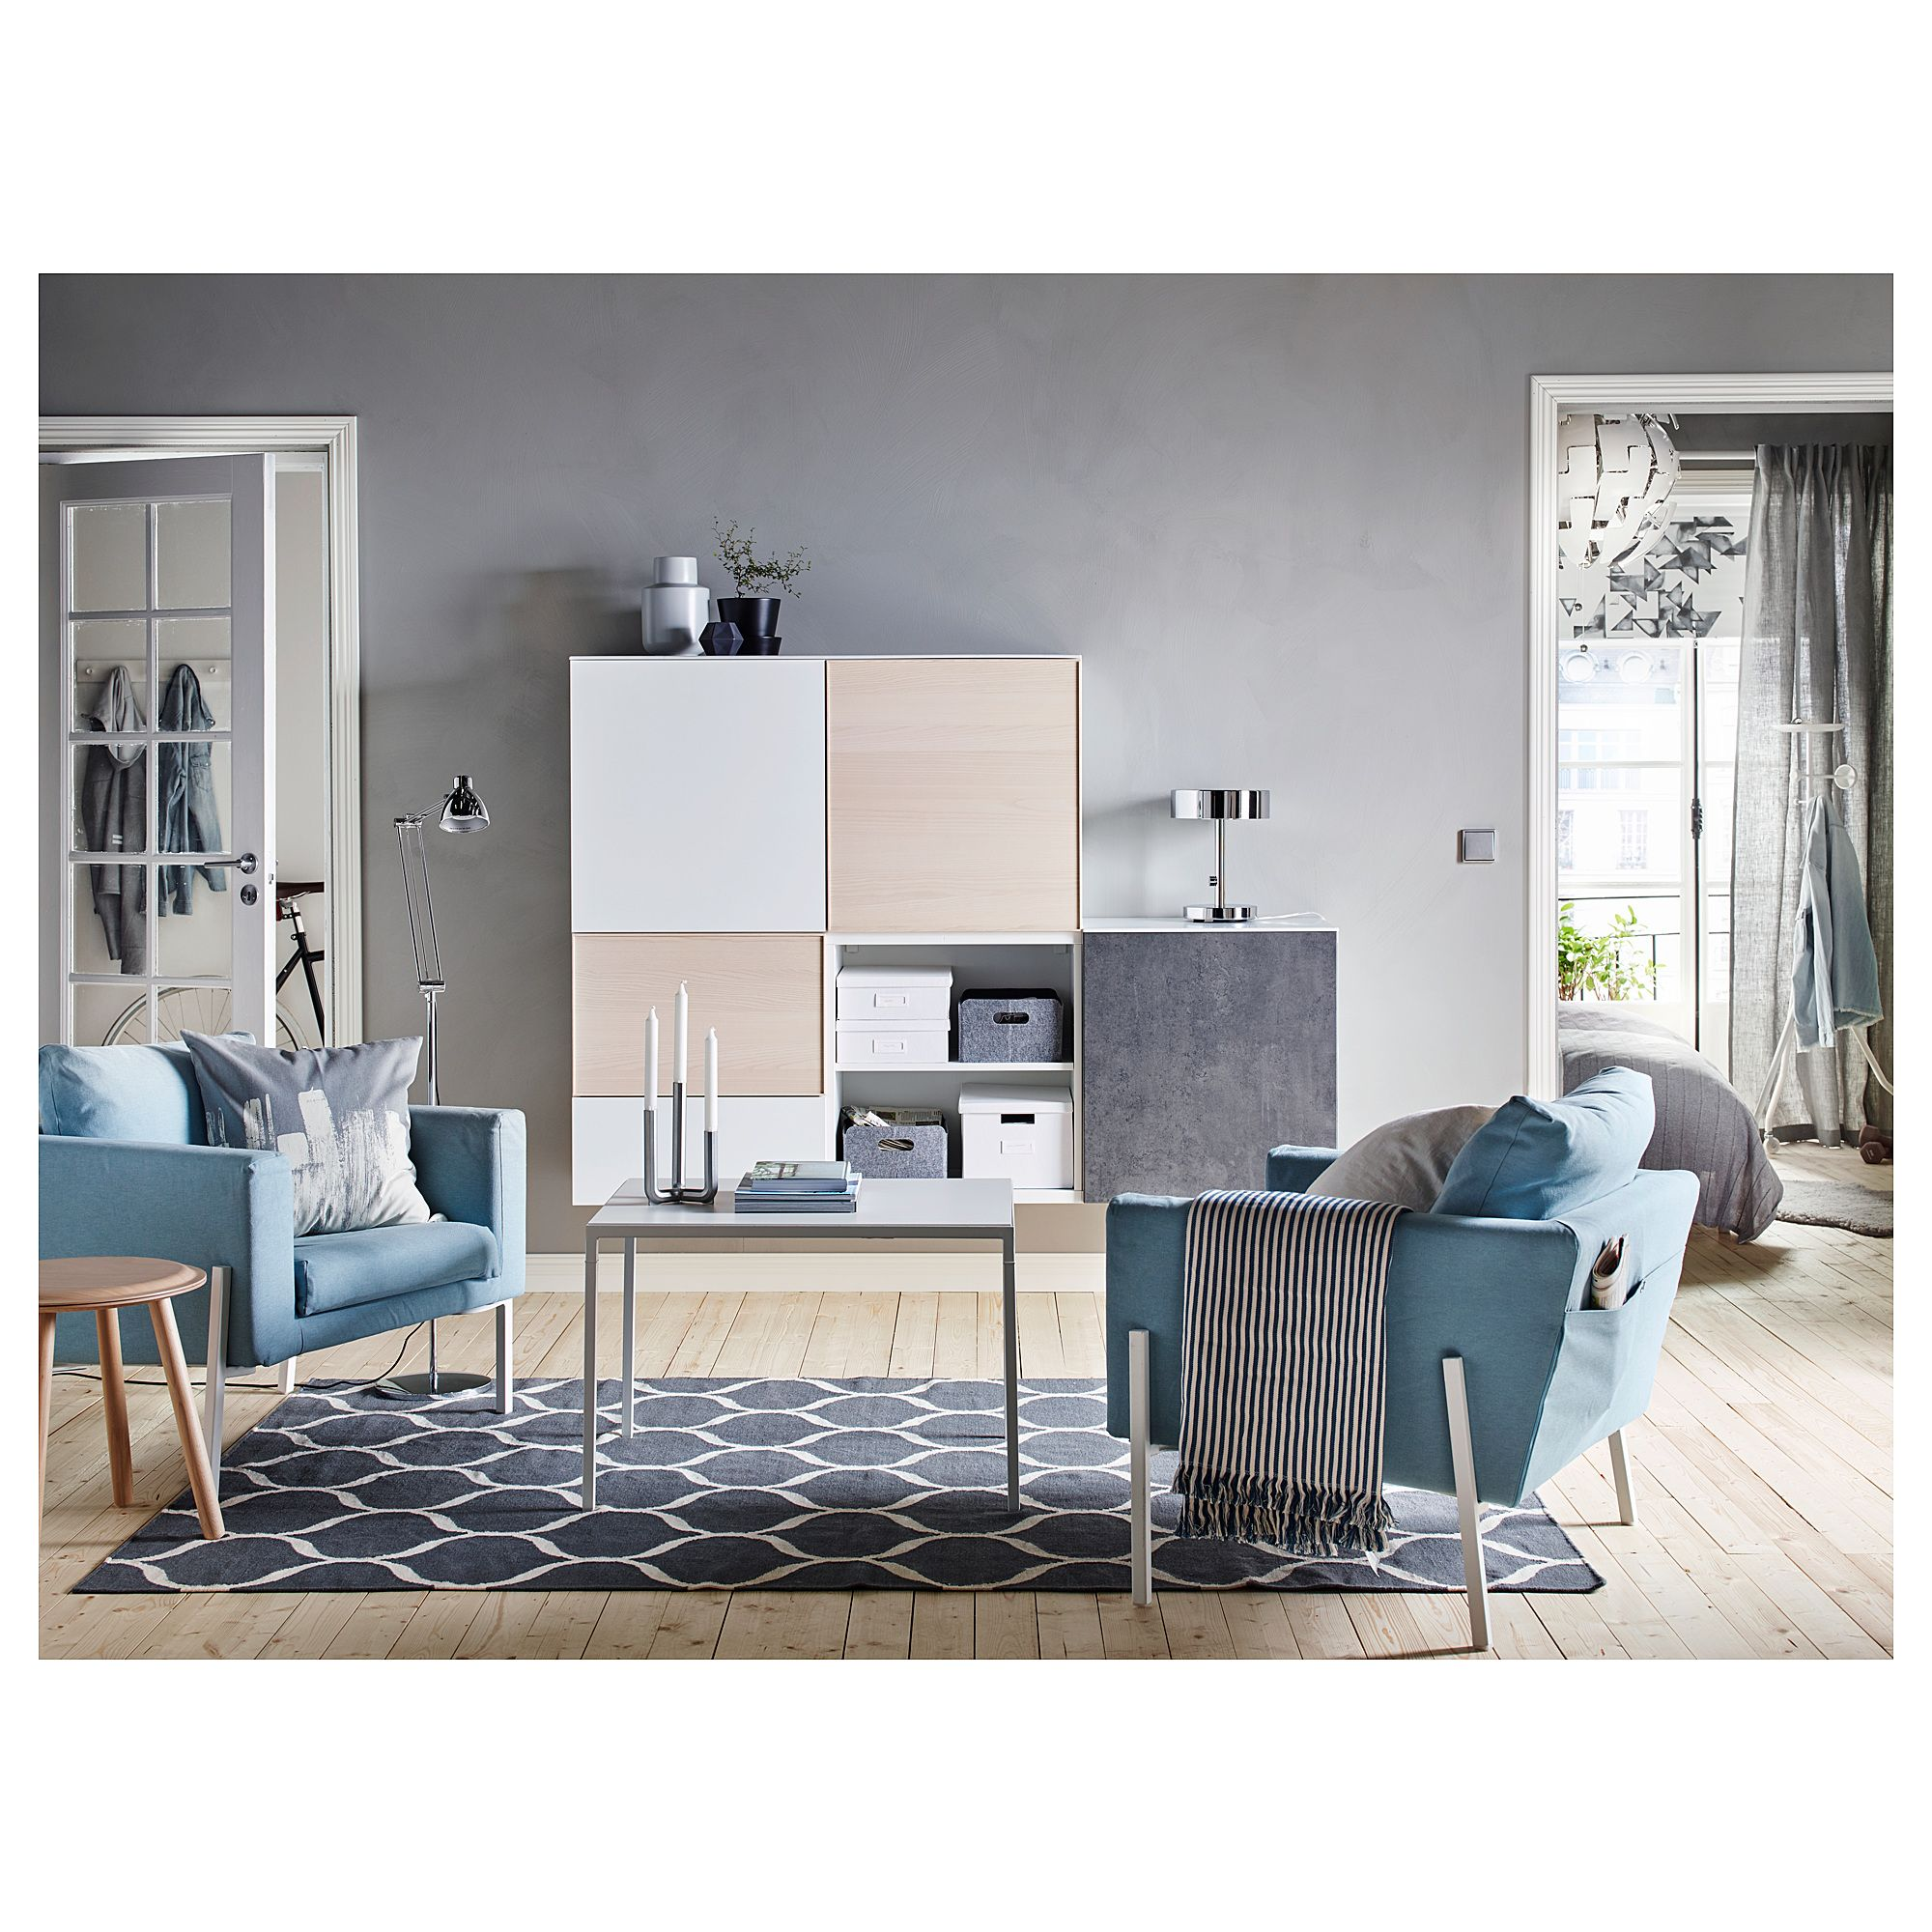 Furniture Home Furnishings Find Your Inspiration Furniture Apartment Furniture Cabinet Decor [ 2000 x 2000 Pixel ]